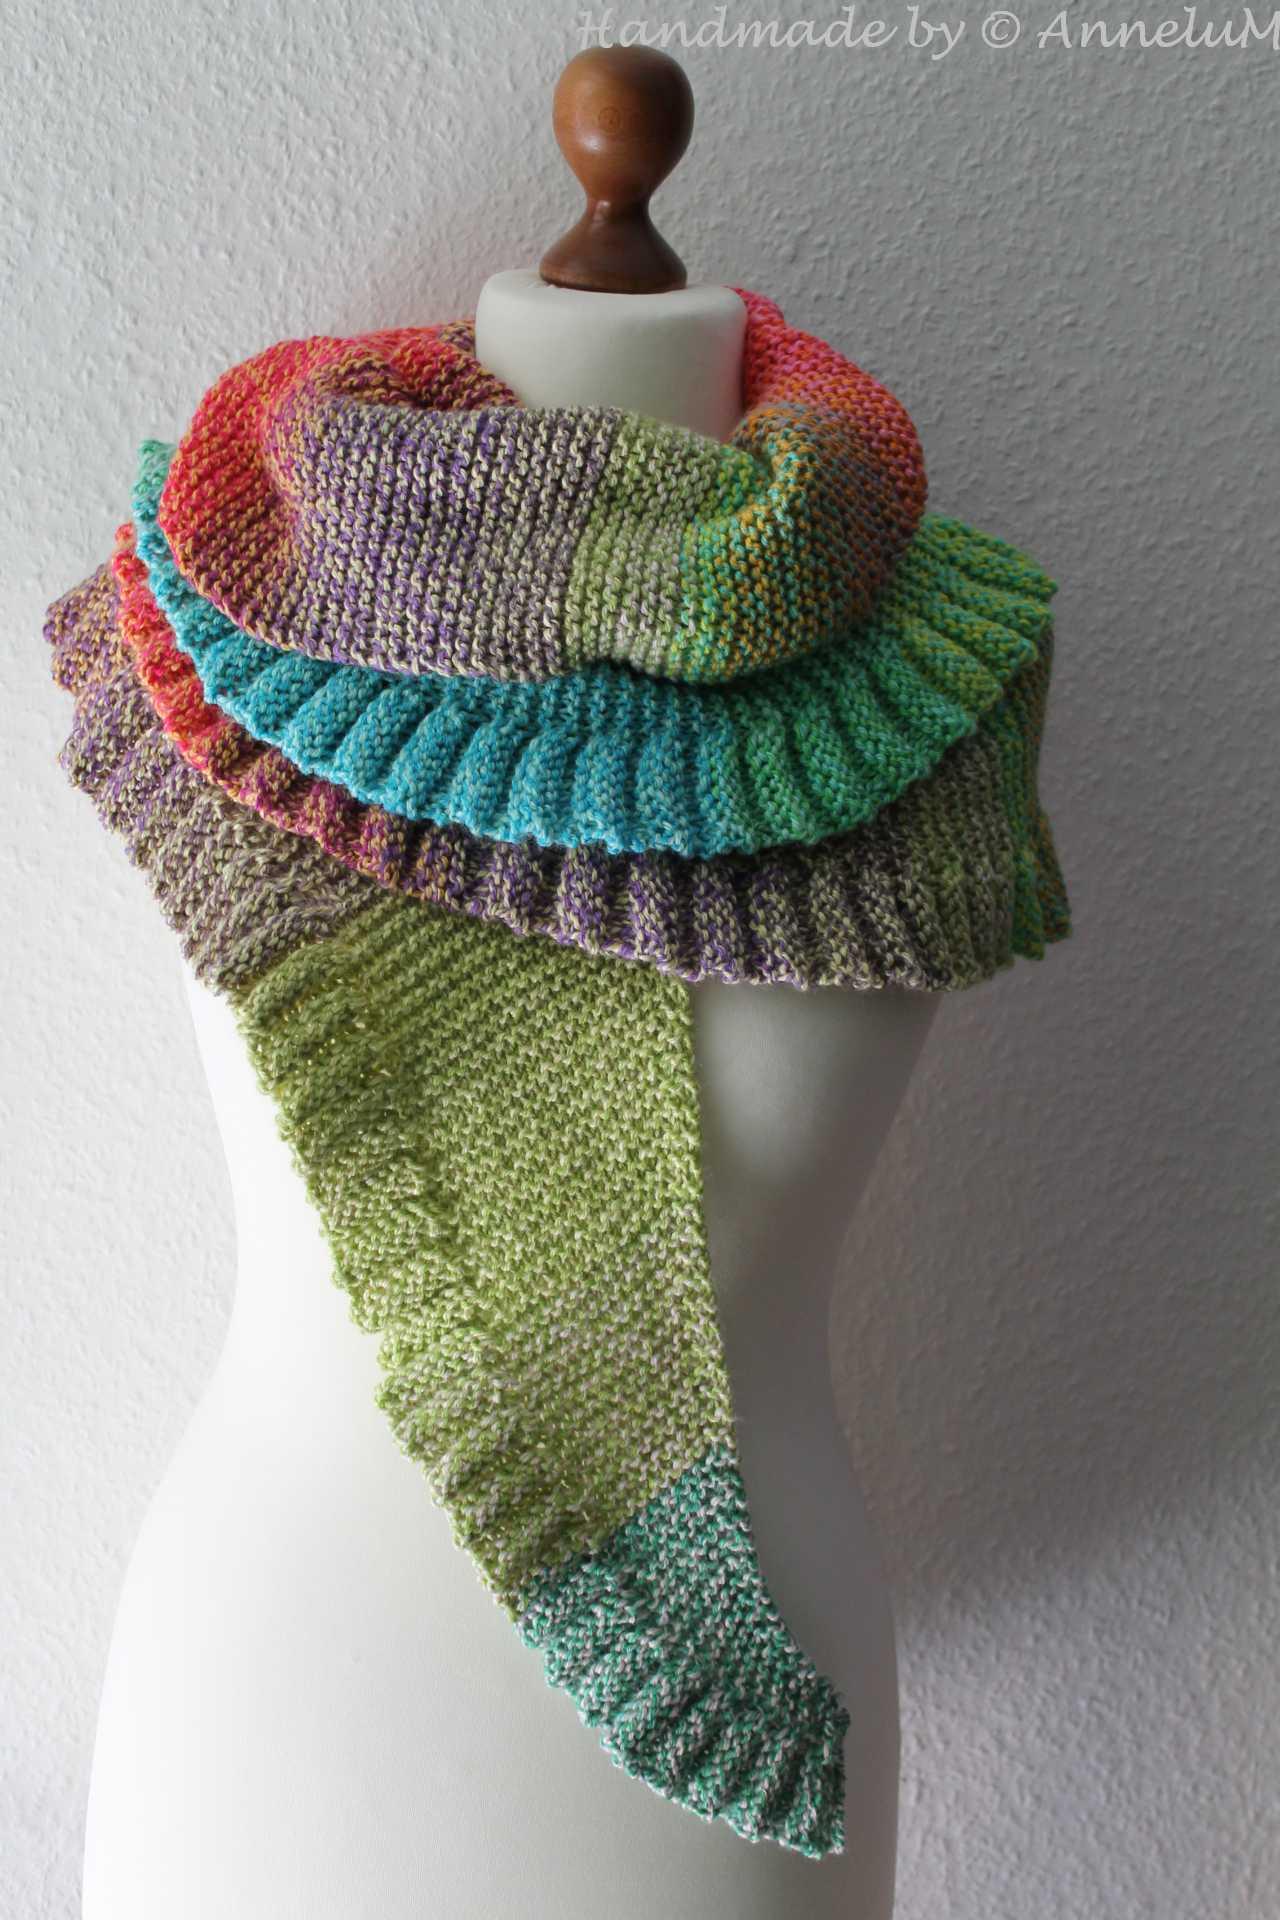 Lollipop-Shawl Handmade by AnneluM